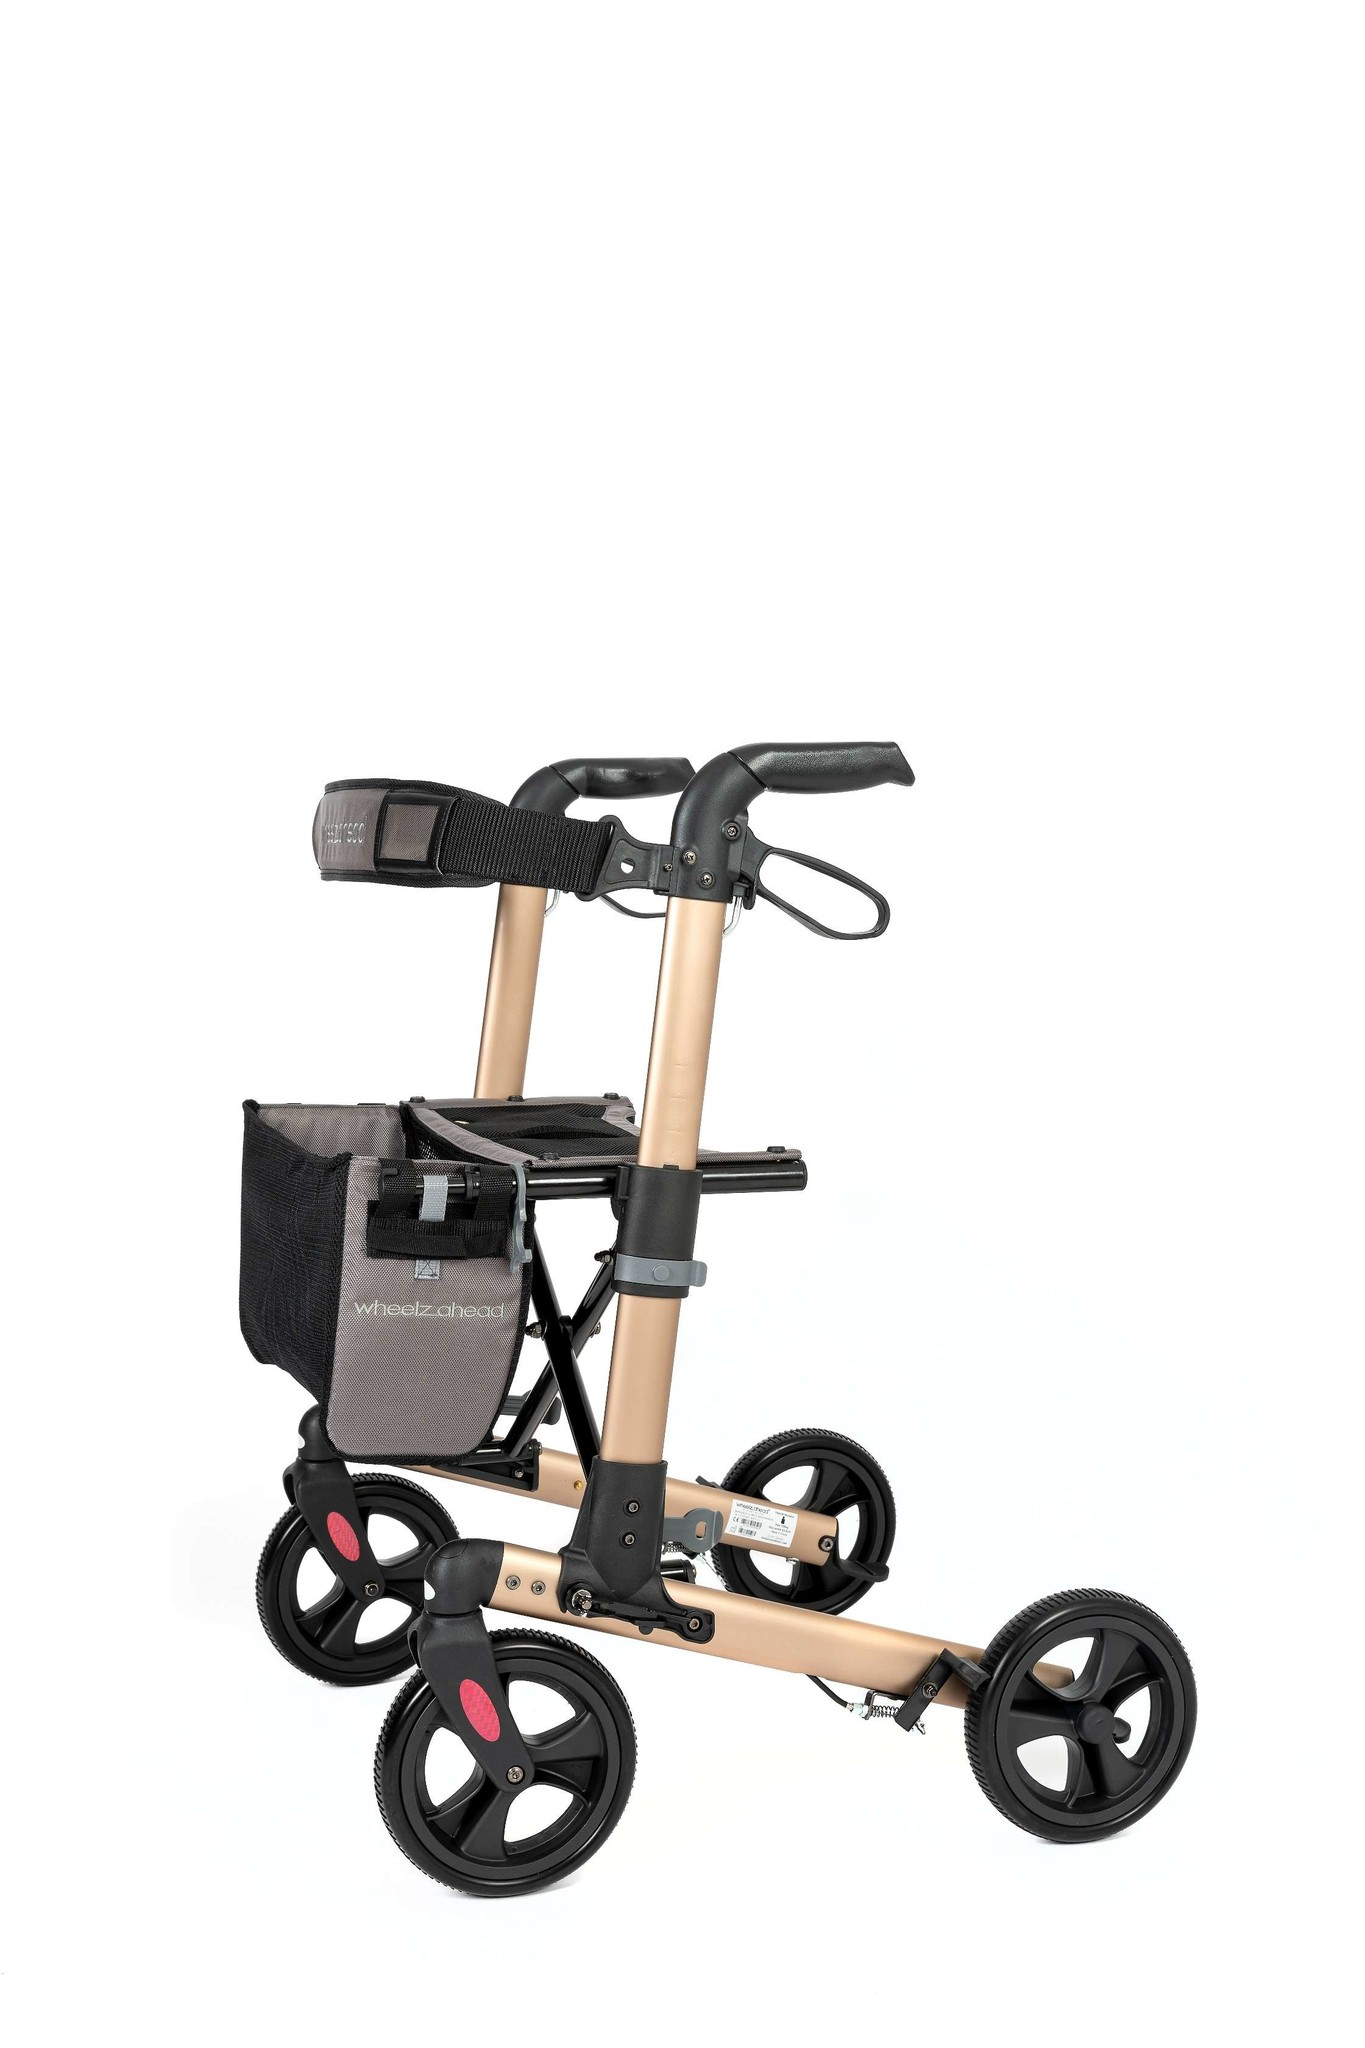 Wheelzahead Rollator TRACK Champagne Wheelzahead